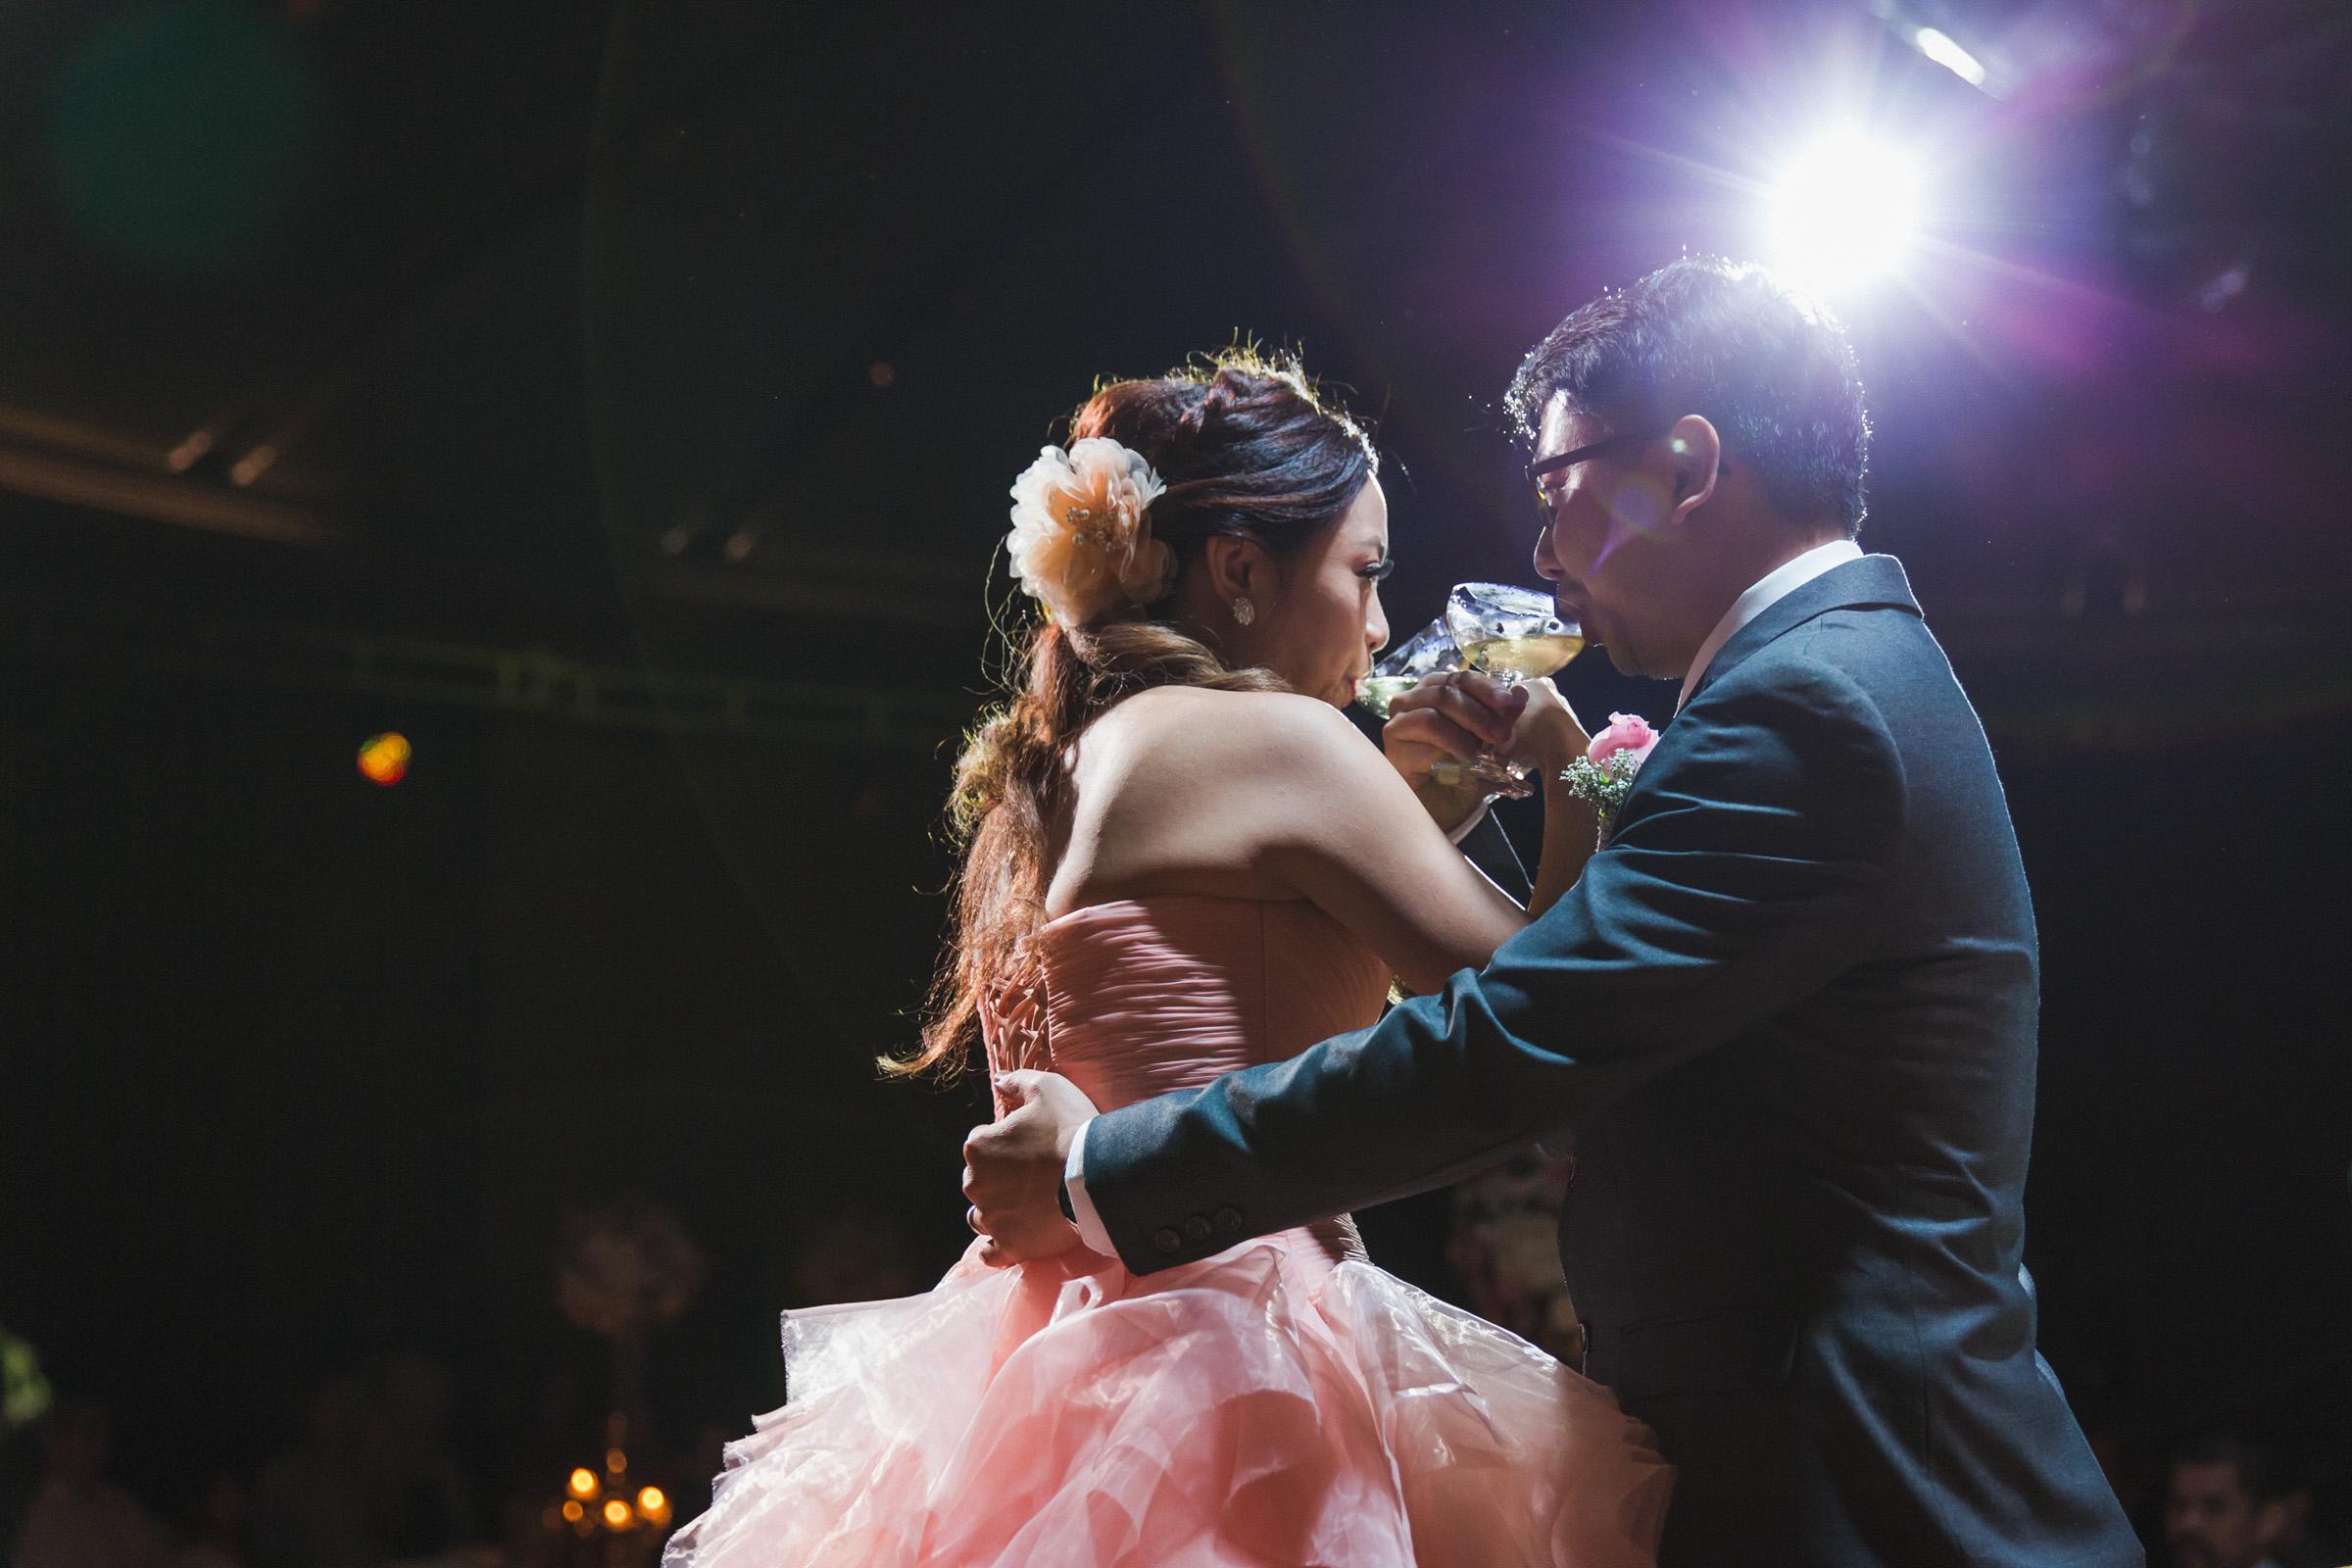 Steven_Jasmine_Wedding_Walldrobe Photography_Wedding shoots_Actual day wedding_Photographer (3)